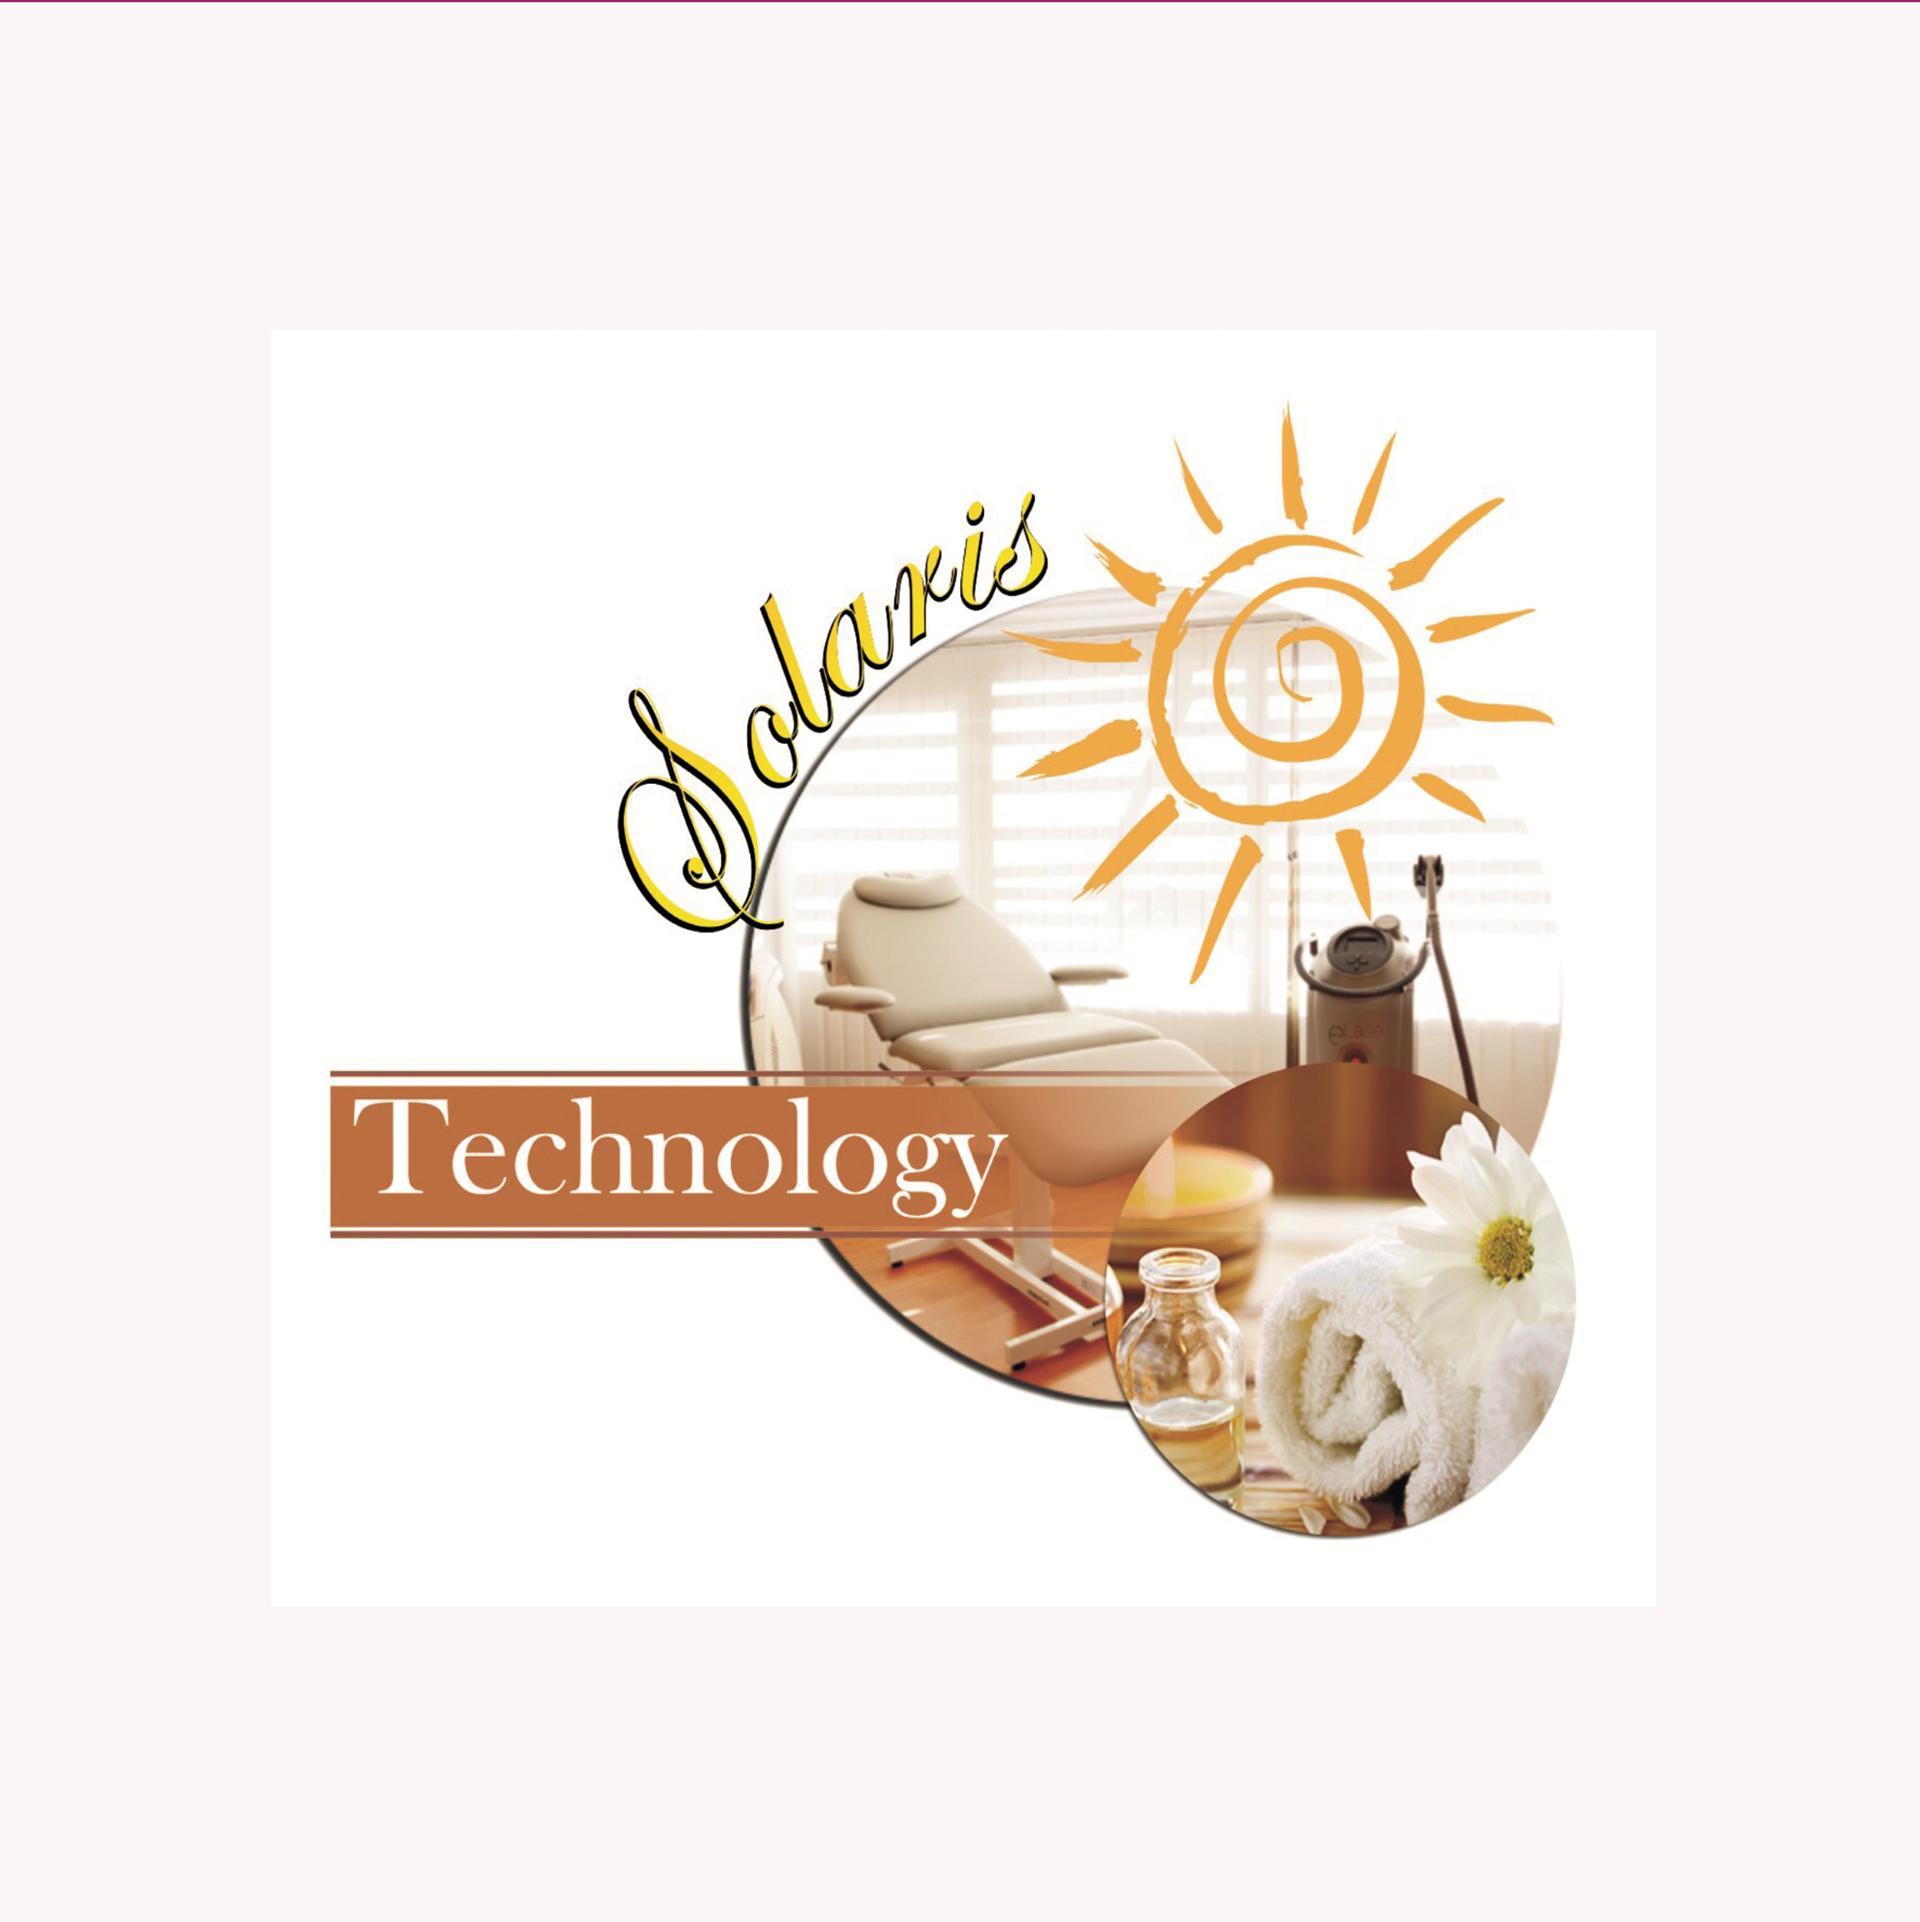 SOLARIS TECHNOLOGY